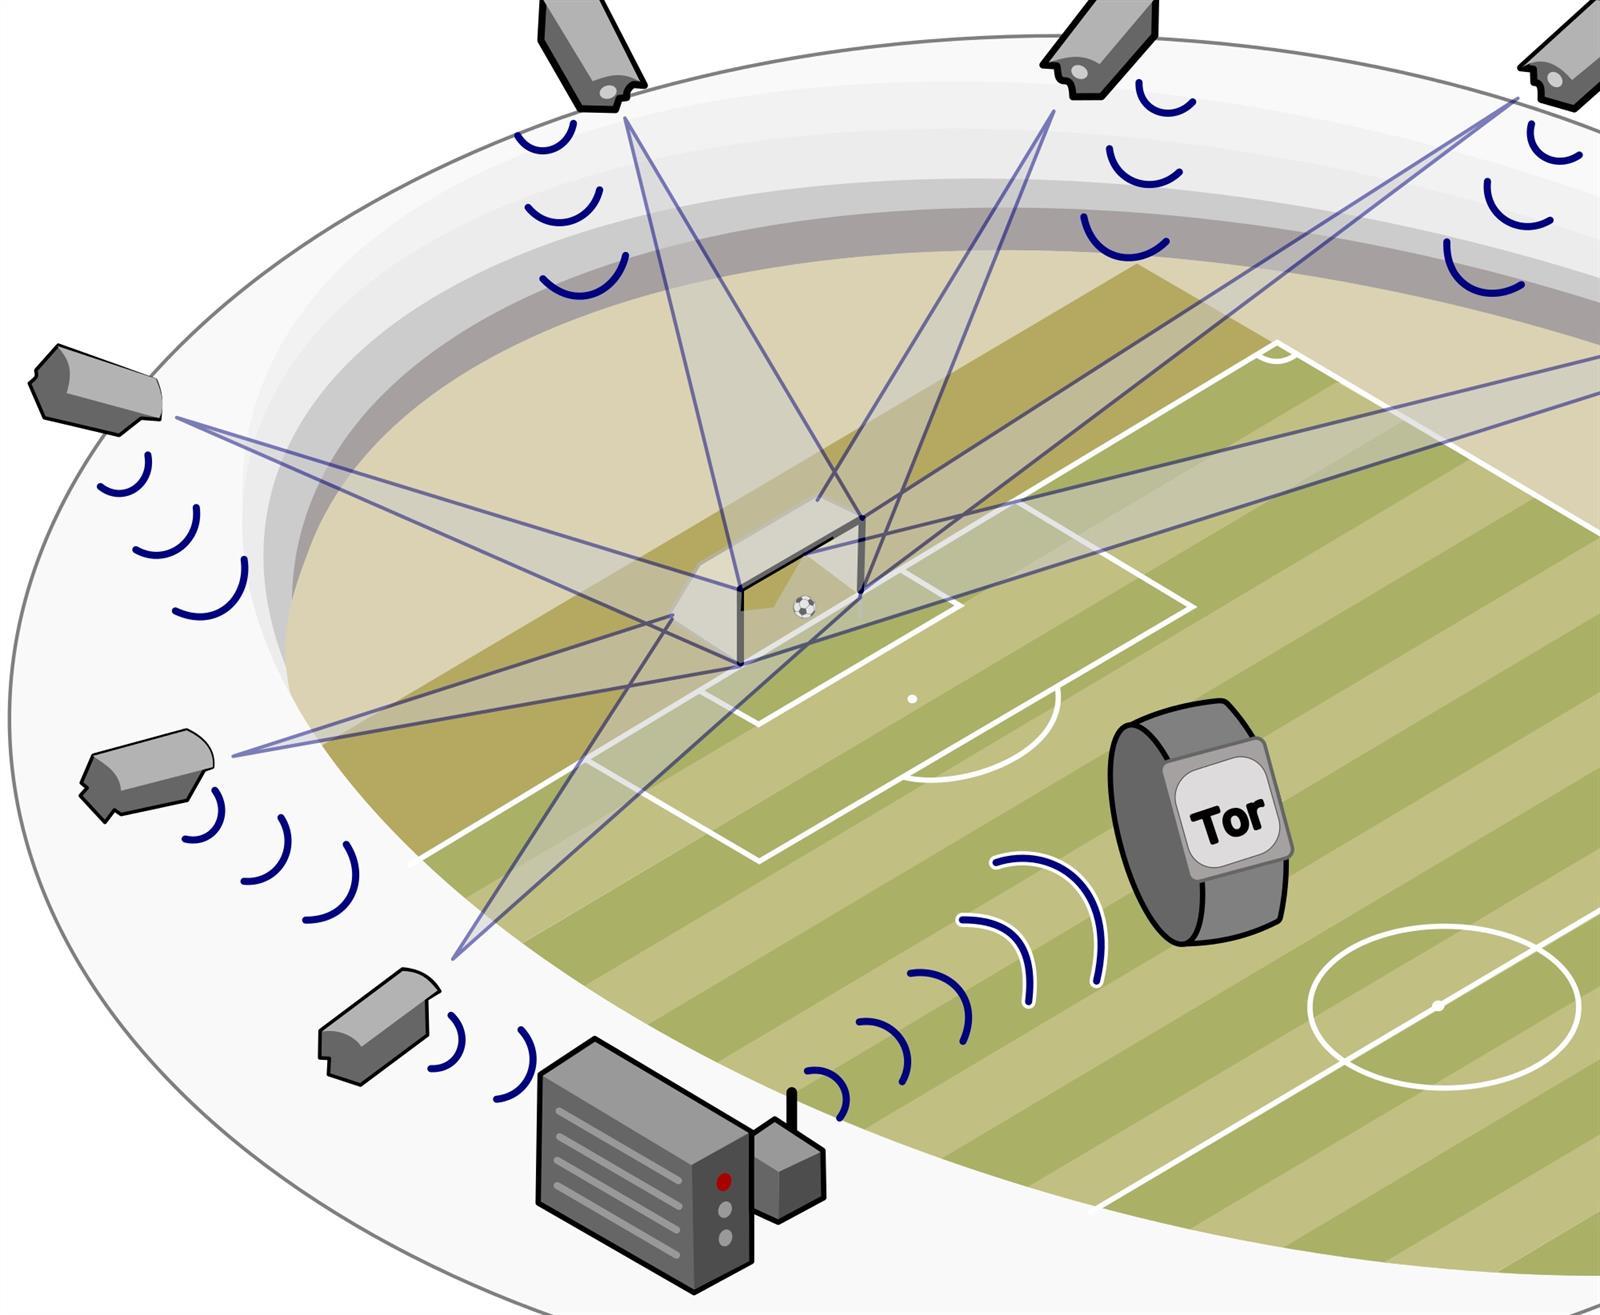 Resultado de imagen para mundial 2018 tecnologia linea de gol